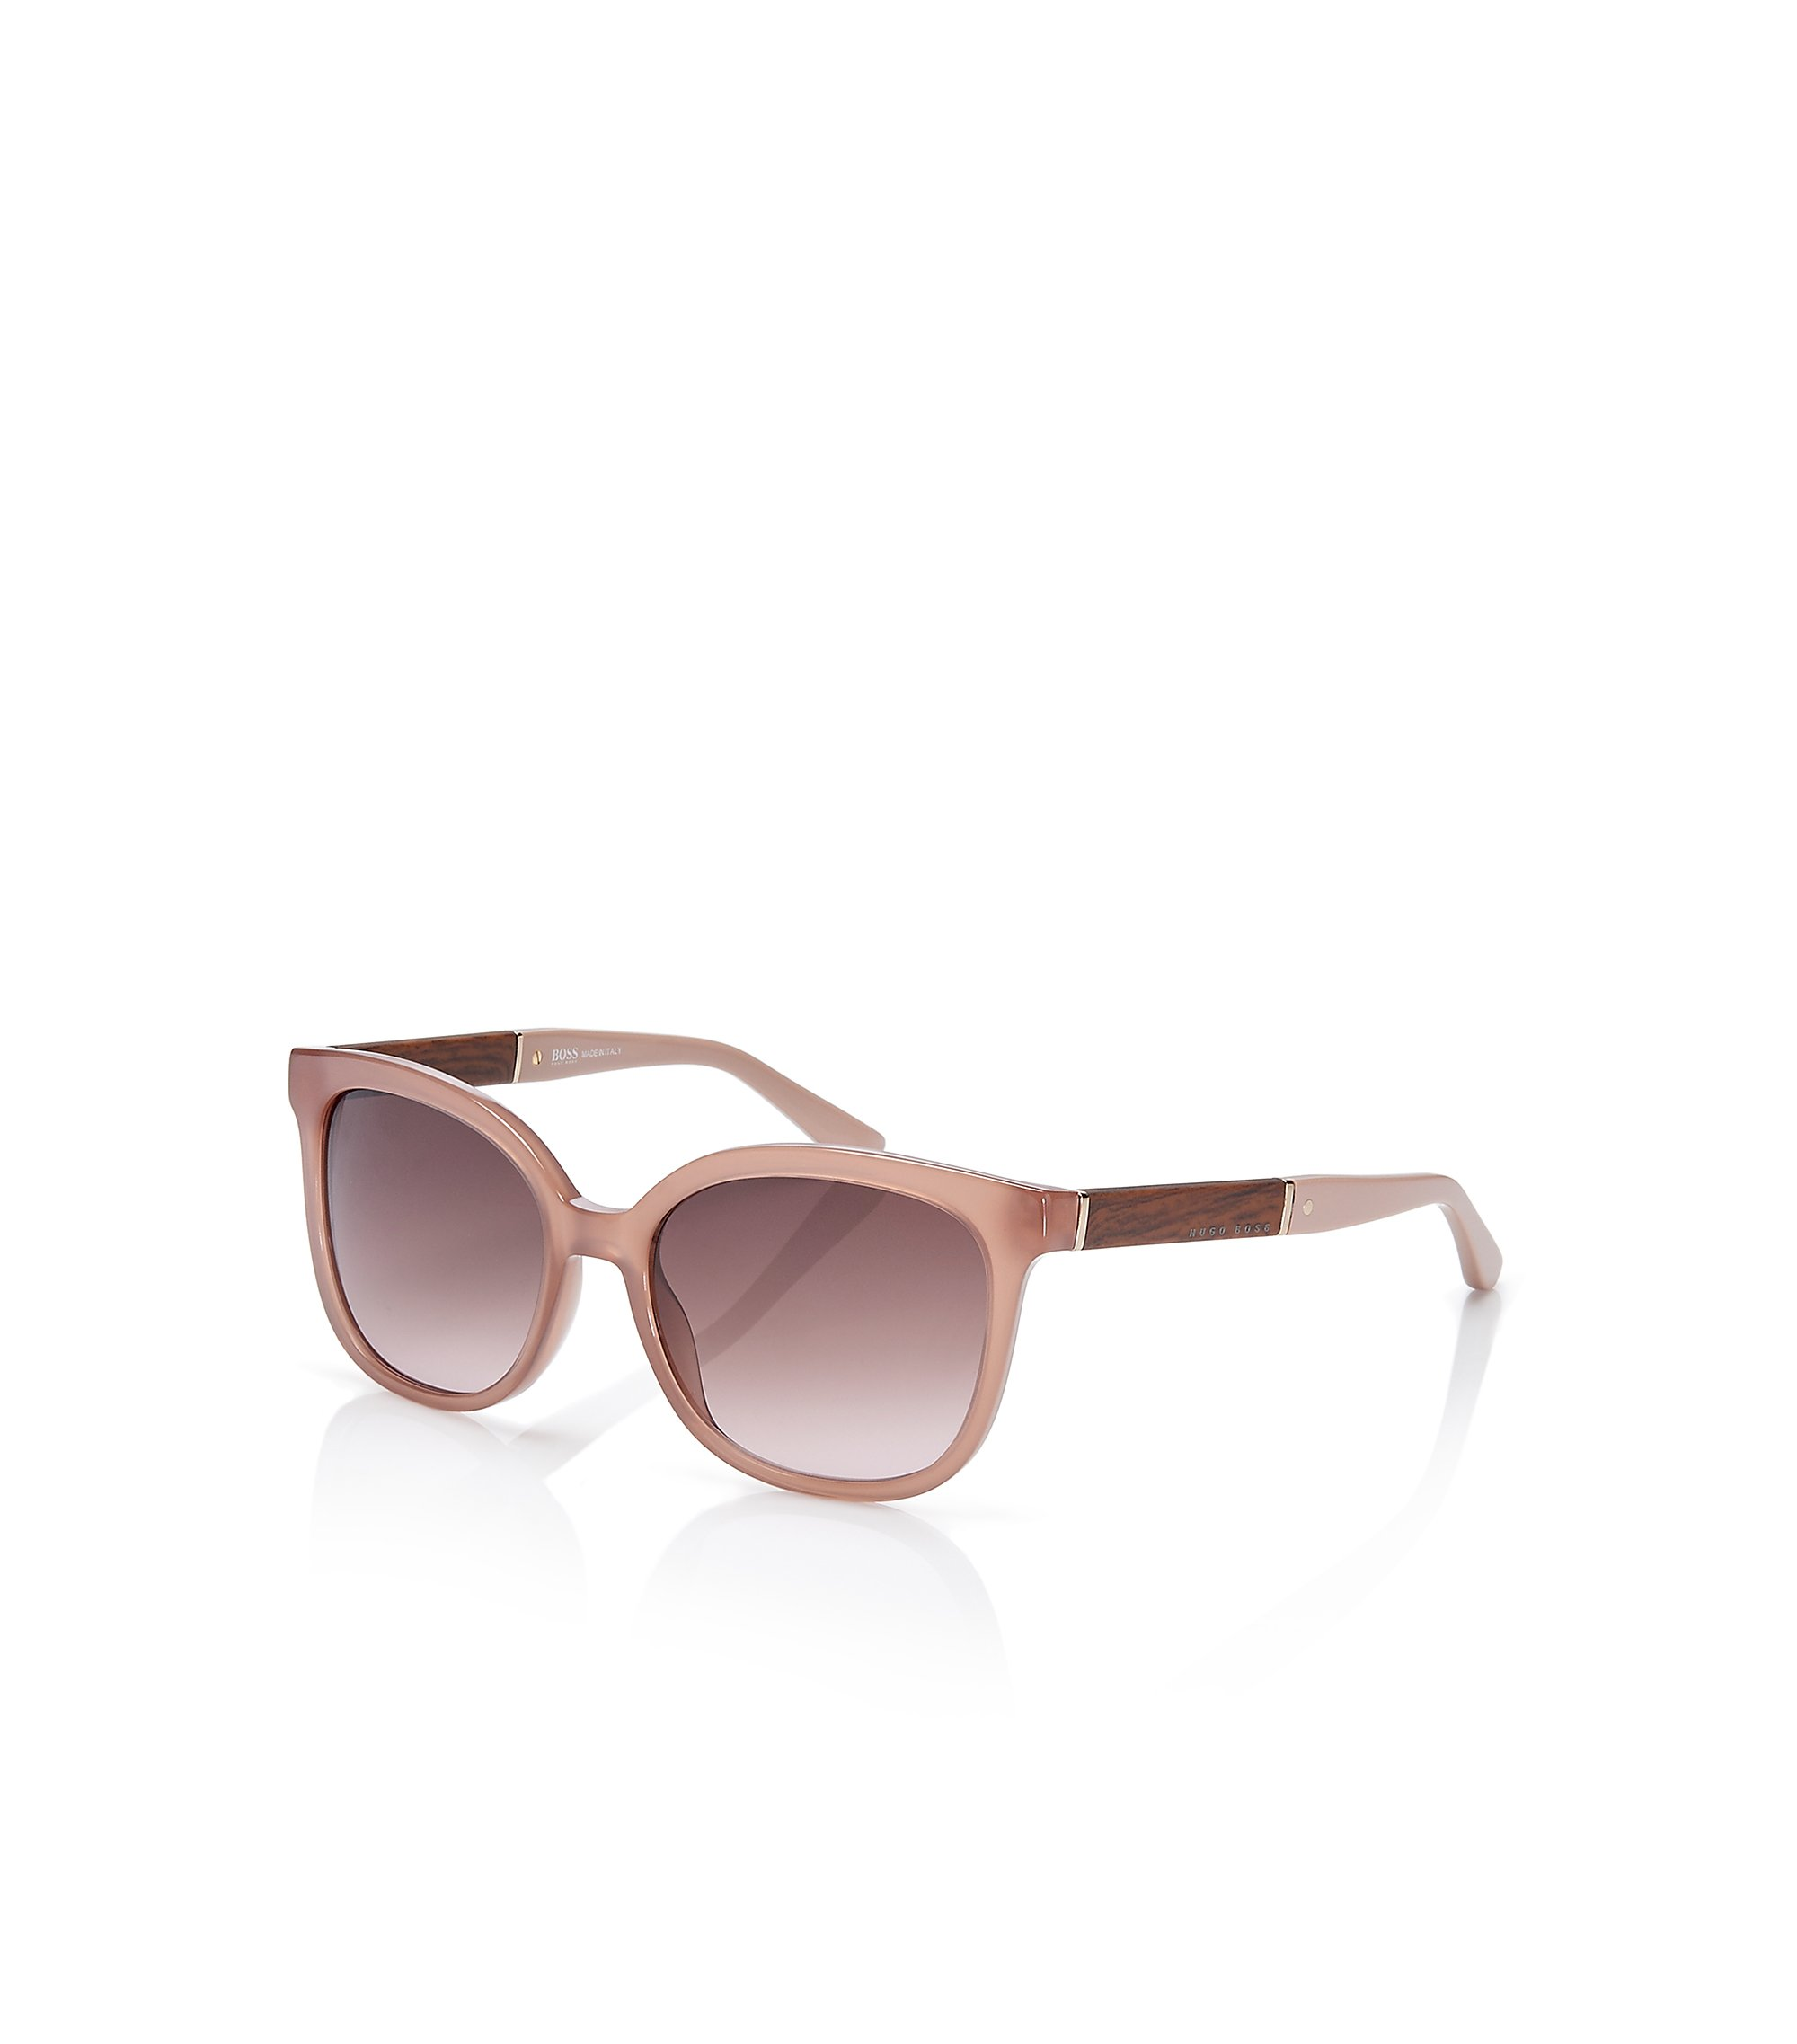 Rectangular Wood Pattern Sunglasses    BOSS 0663S, Assorted-Pre-Pack